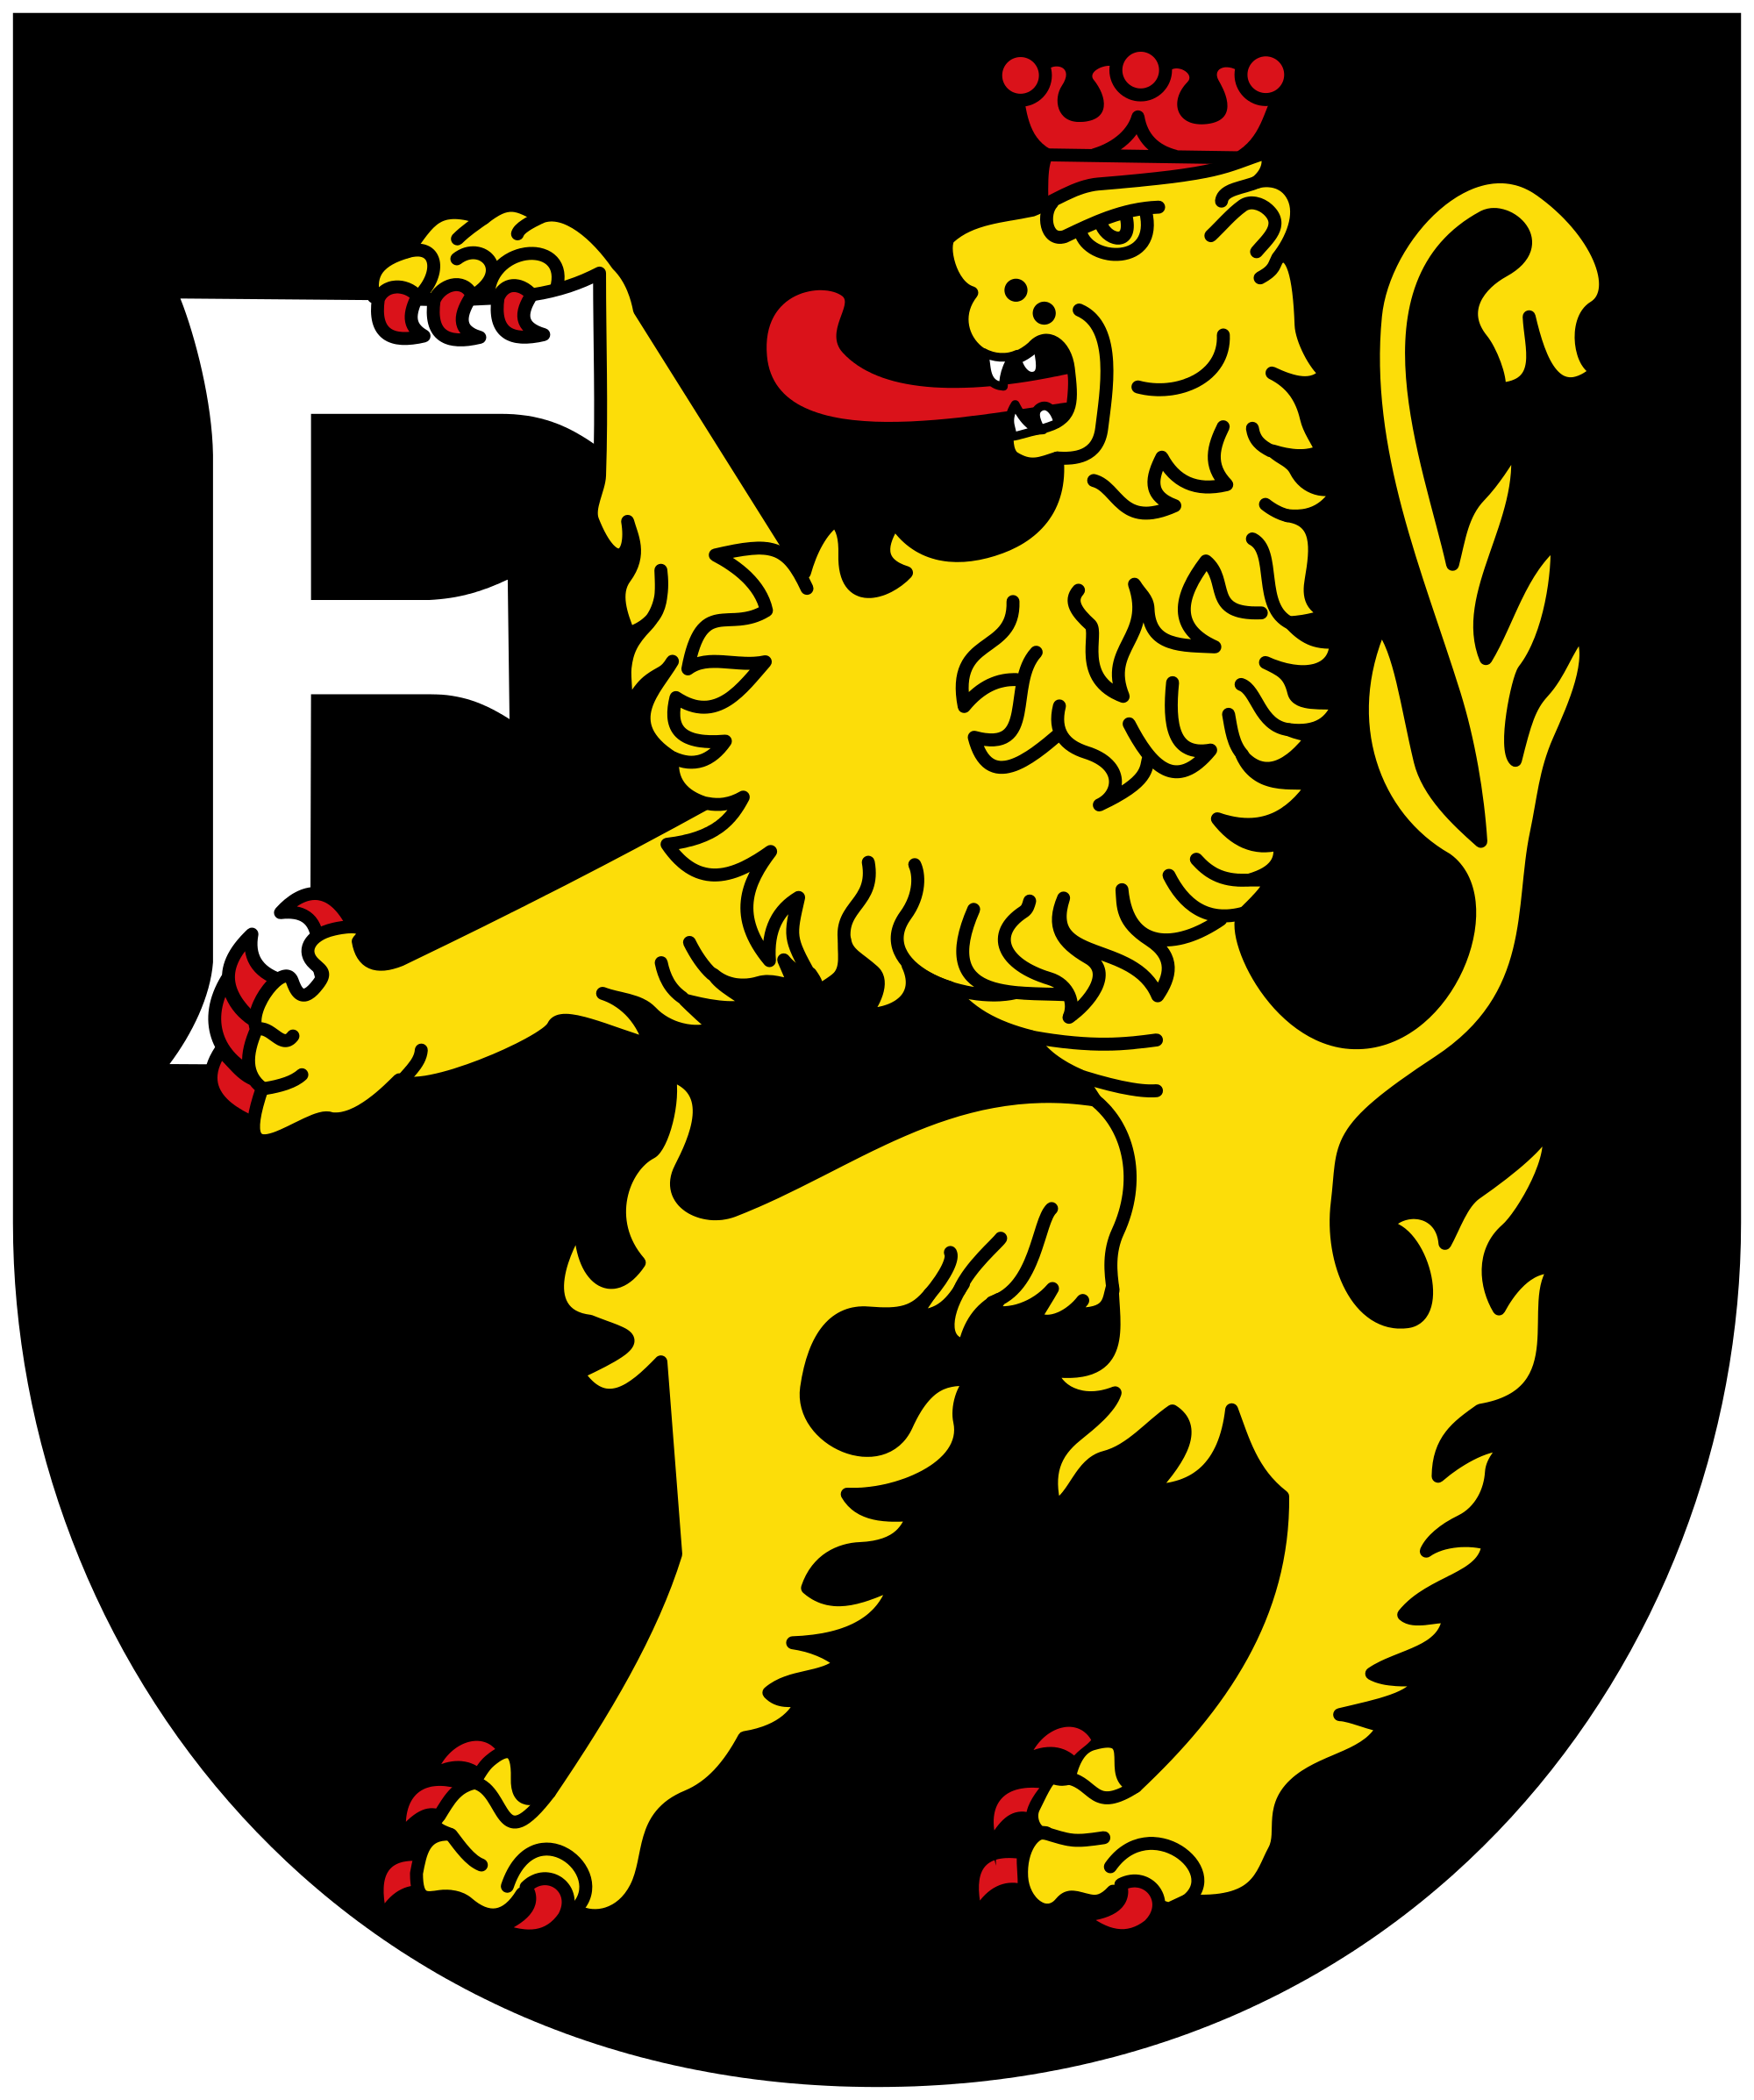 File:DEU Freimersheim (Rheinhessen) COA.svg.